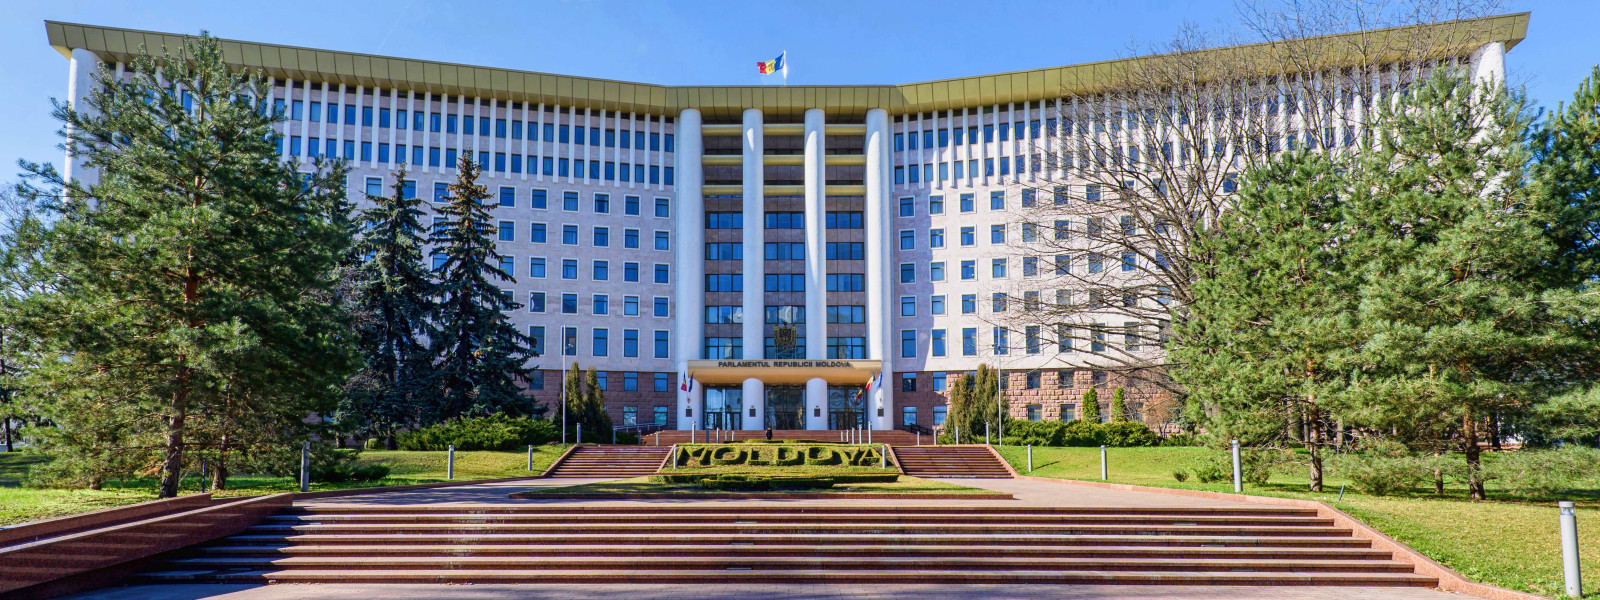 Chisinau-Tour-Guide